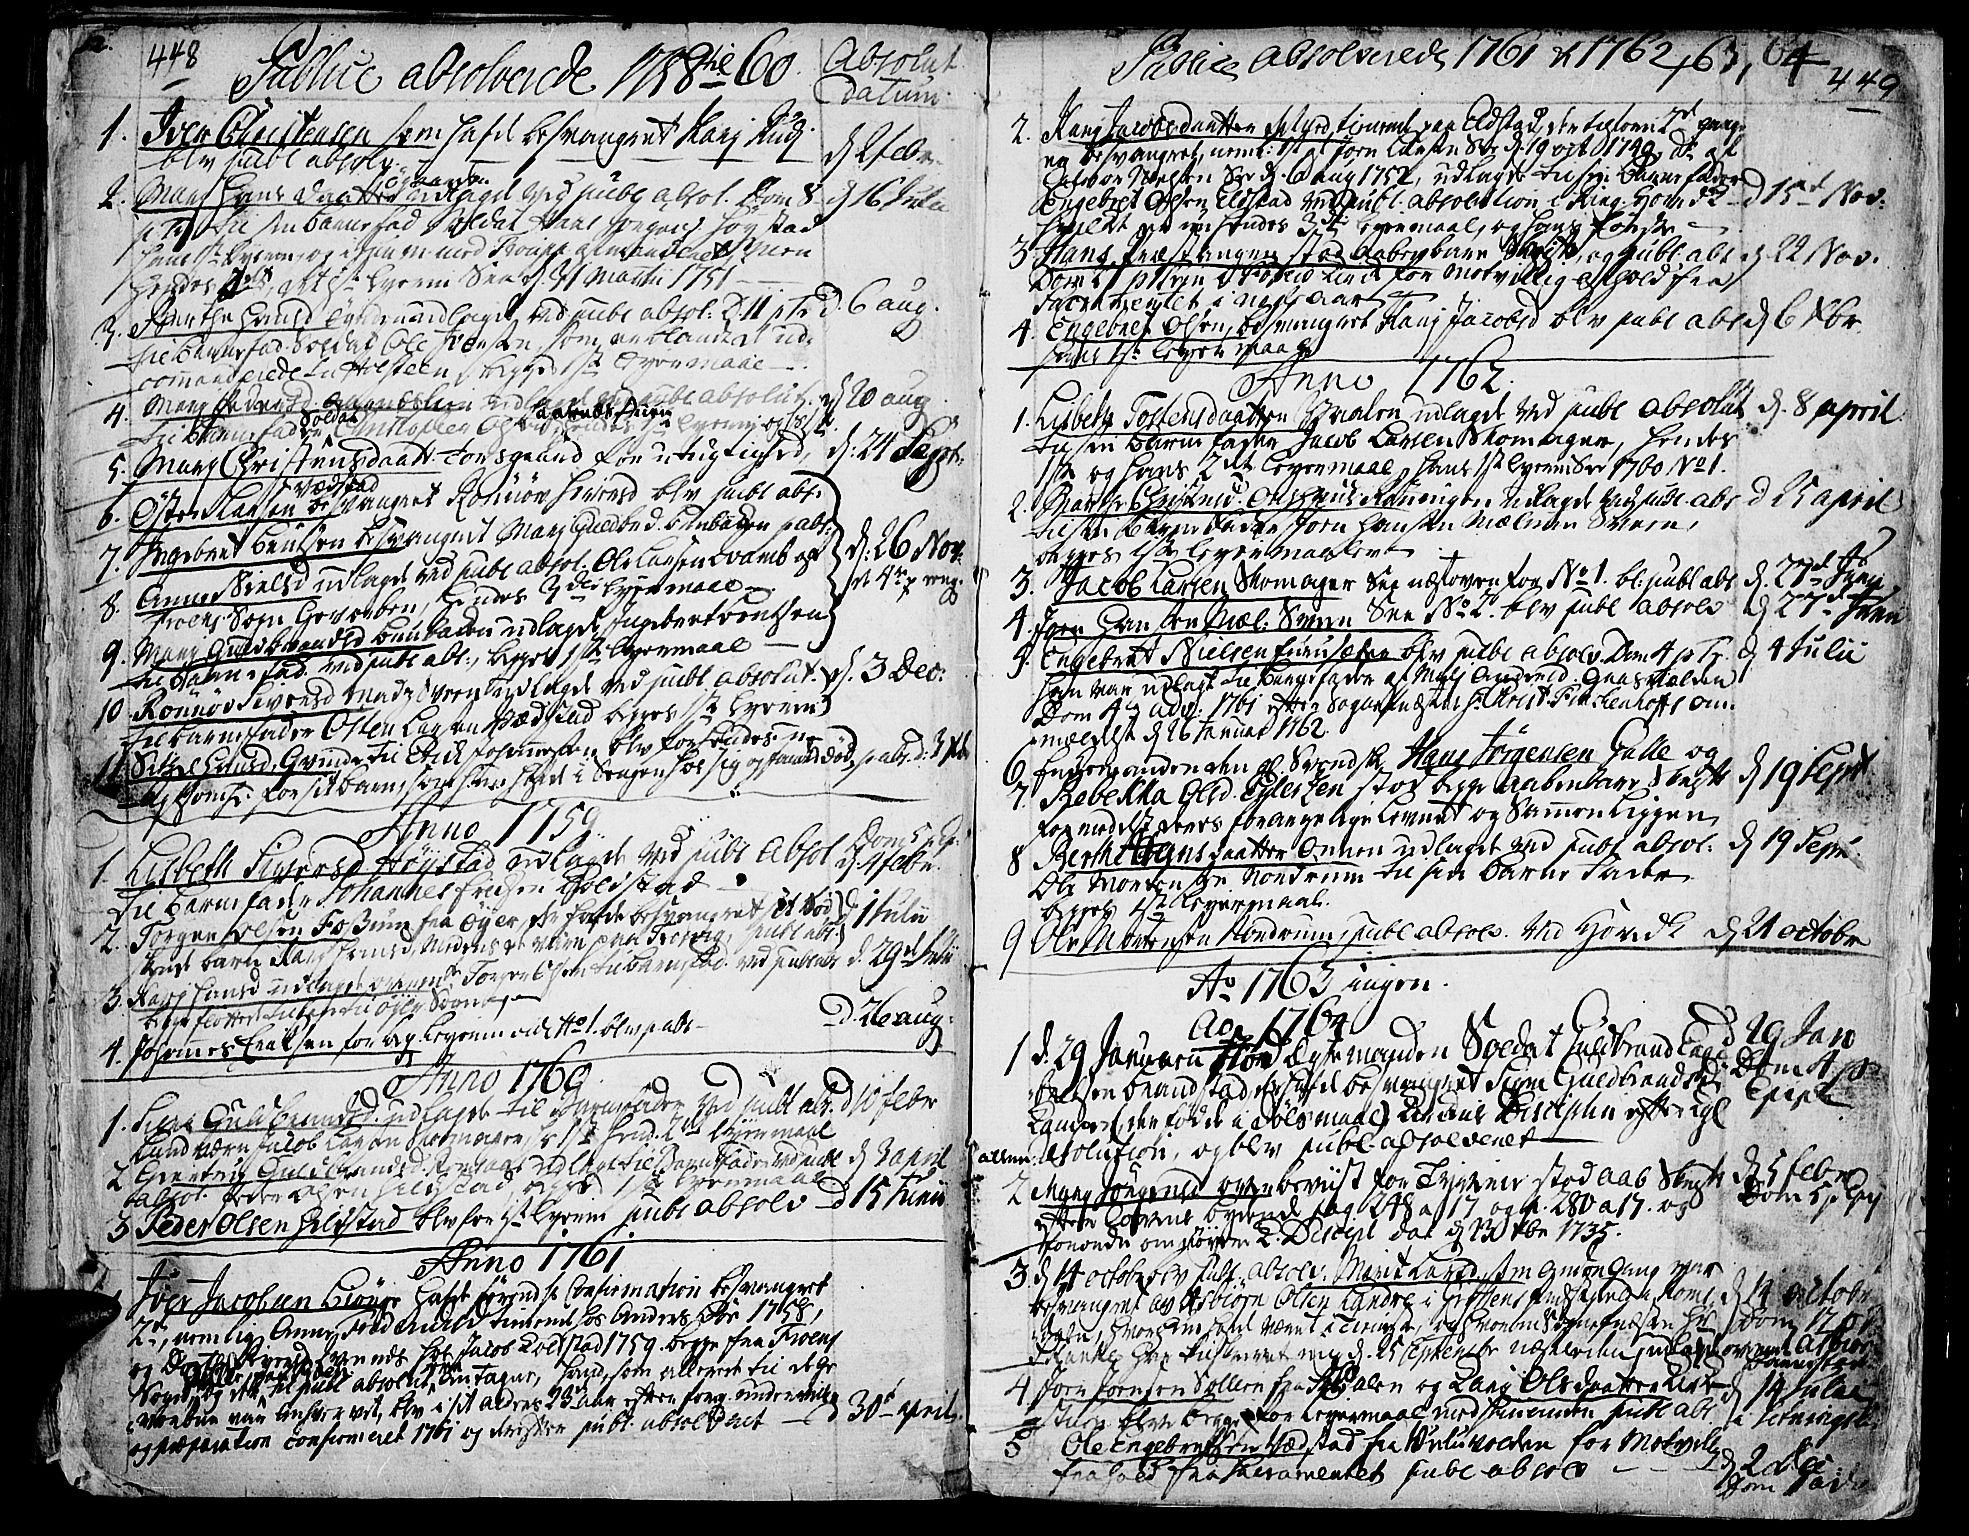 SAH, Ringebu prestekontor, Ministerialbok nr. 2, 1734-1780, s. 448-449